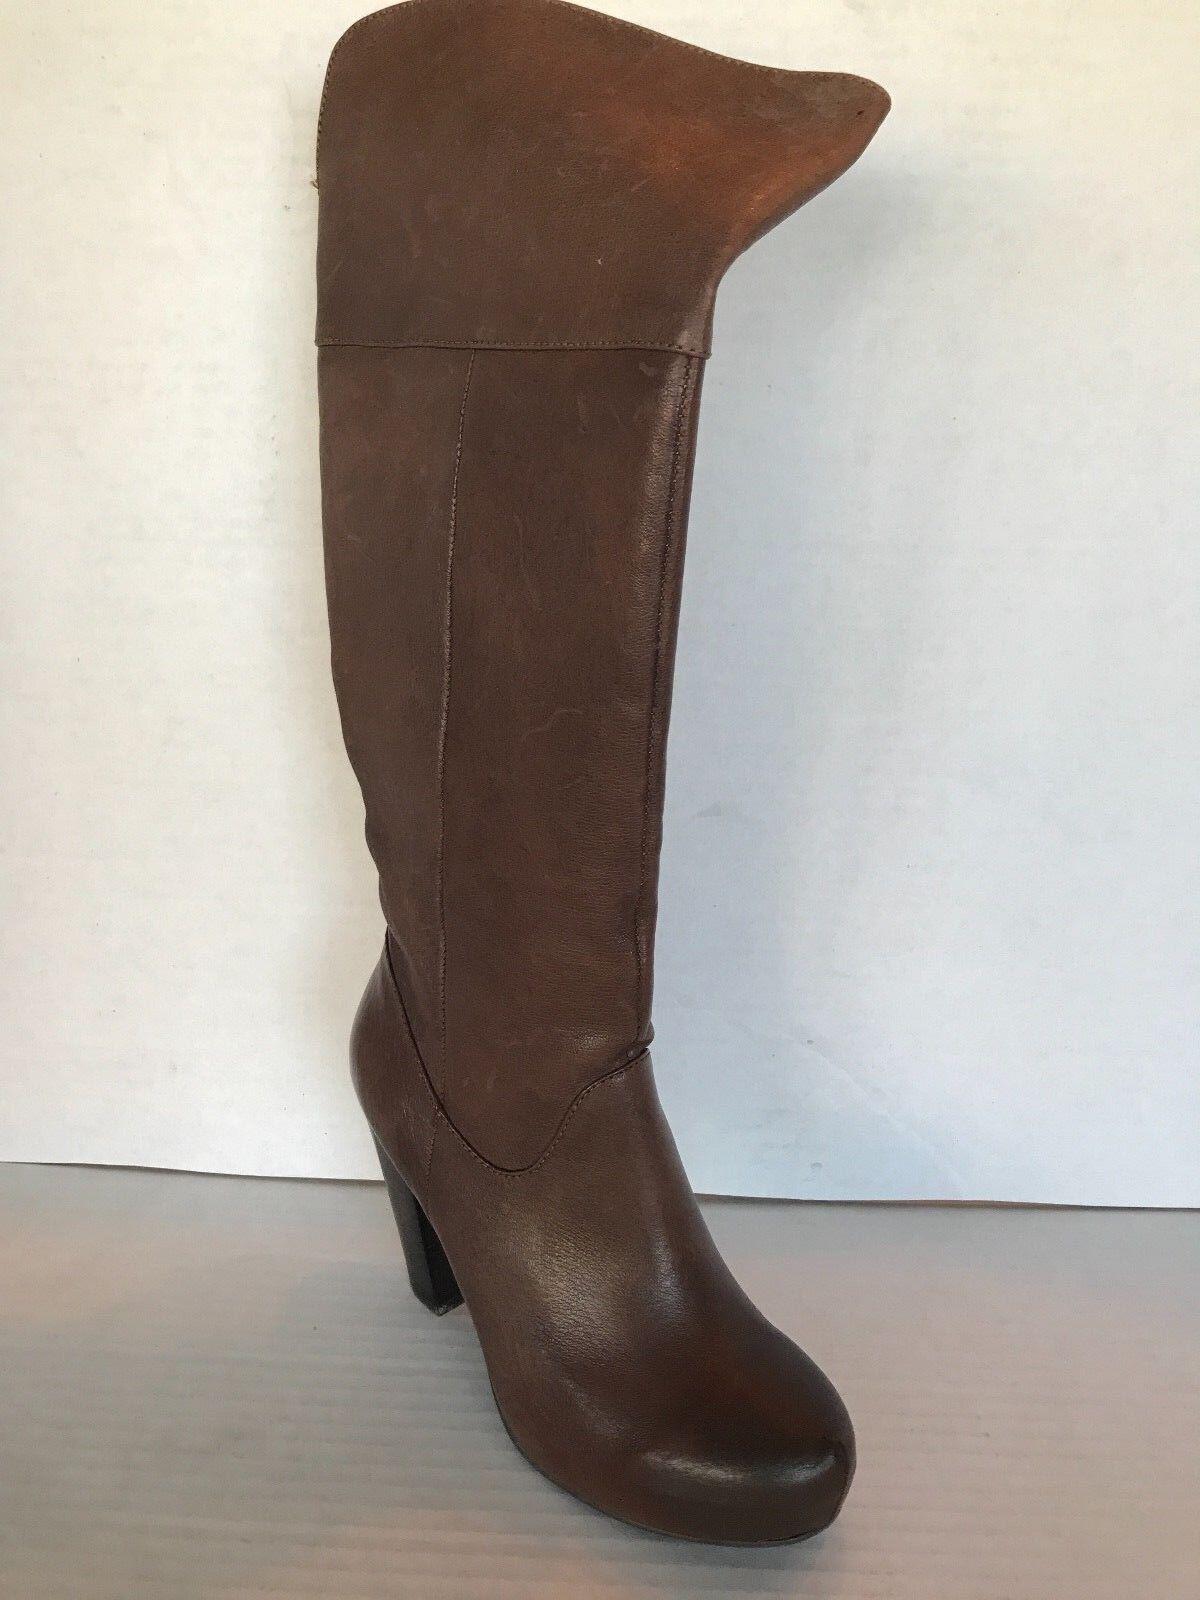 Steve Madden gris Mujer Cuero Marrón rodilla alta botas talla 6 M